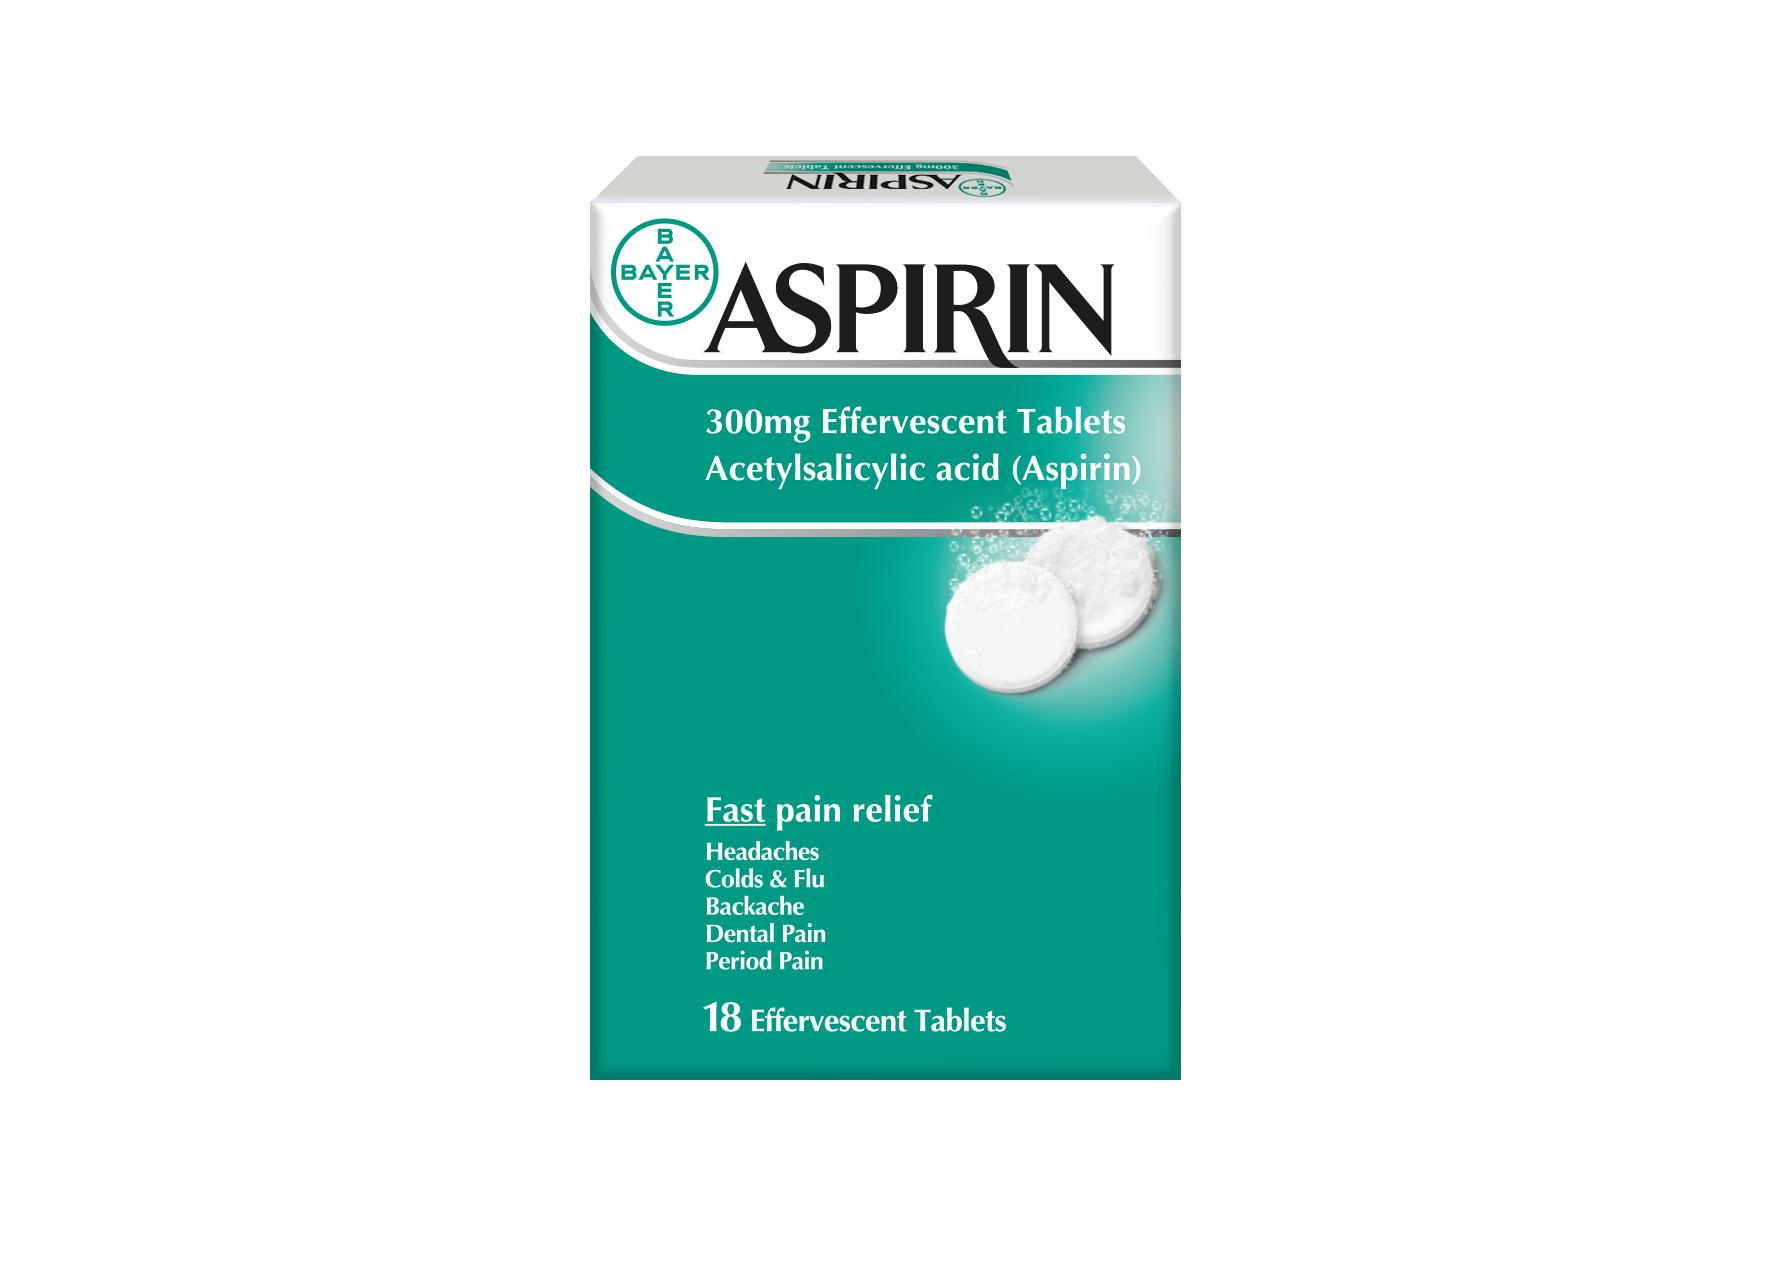 3530_bayer_aspirin_18_FRONT_01.jpeg